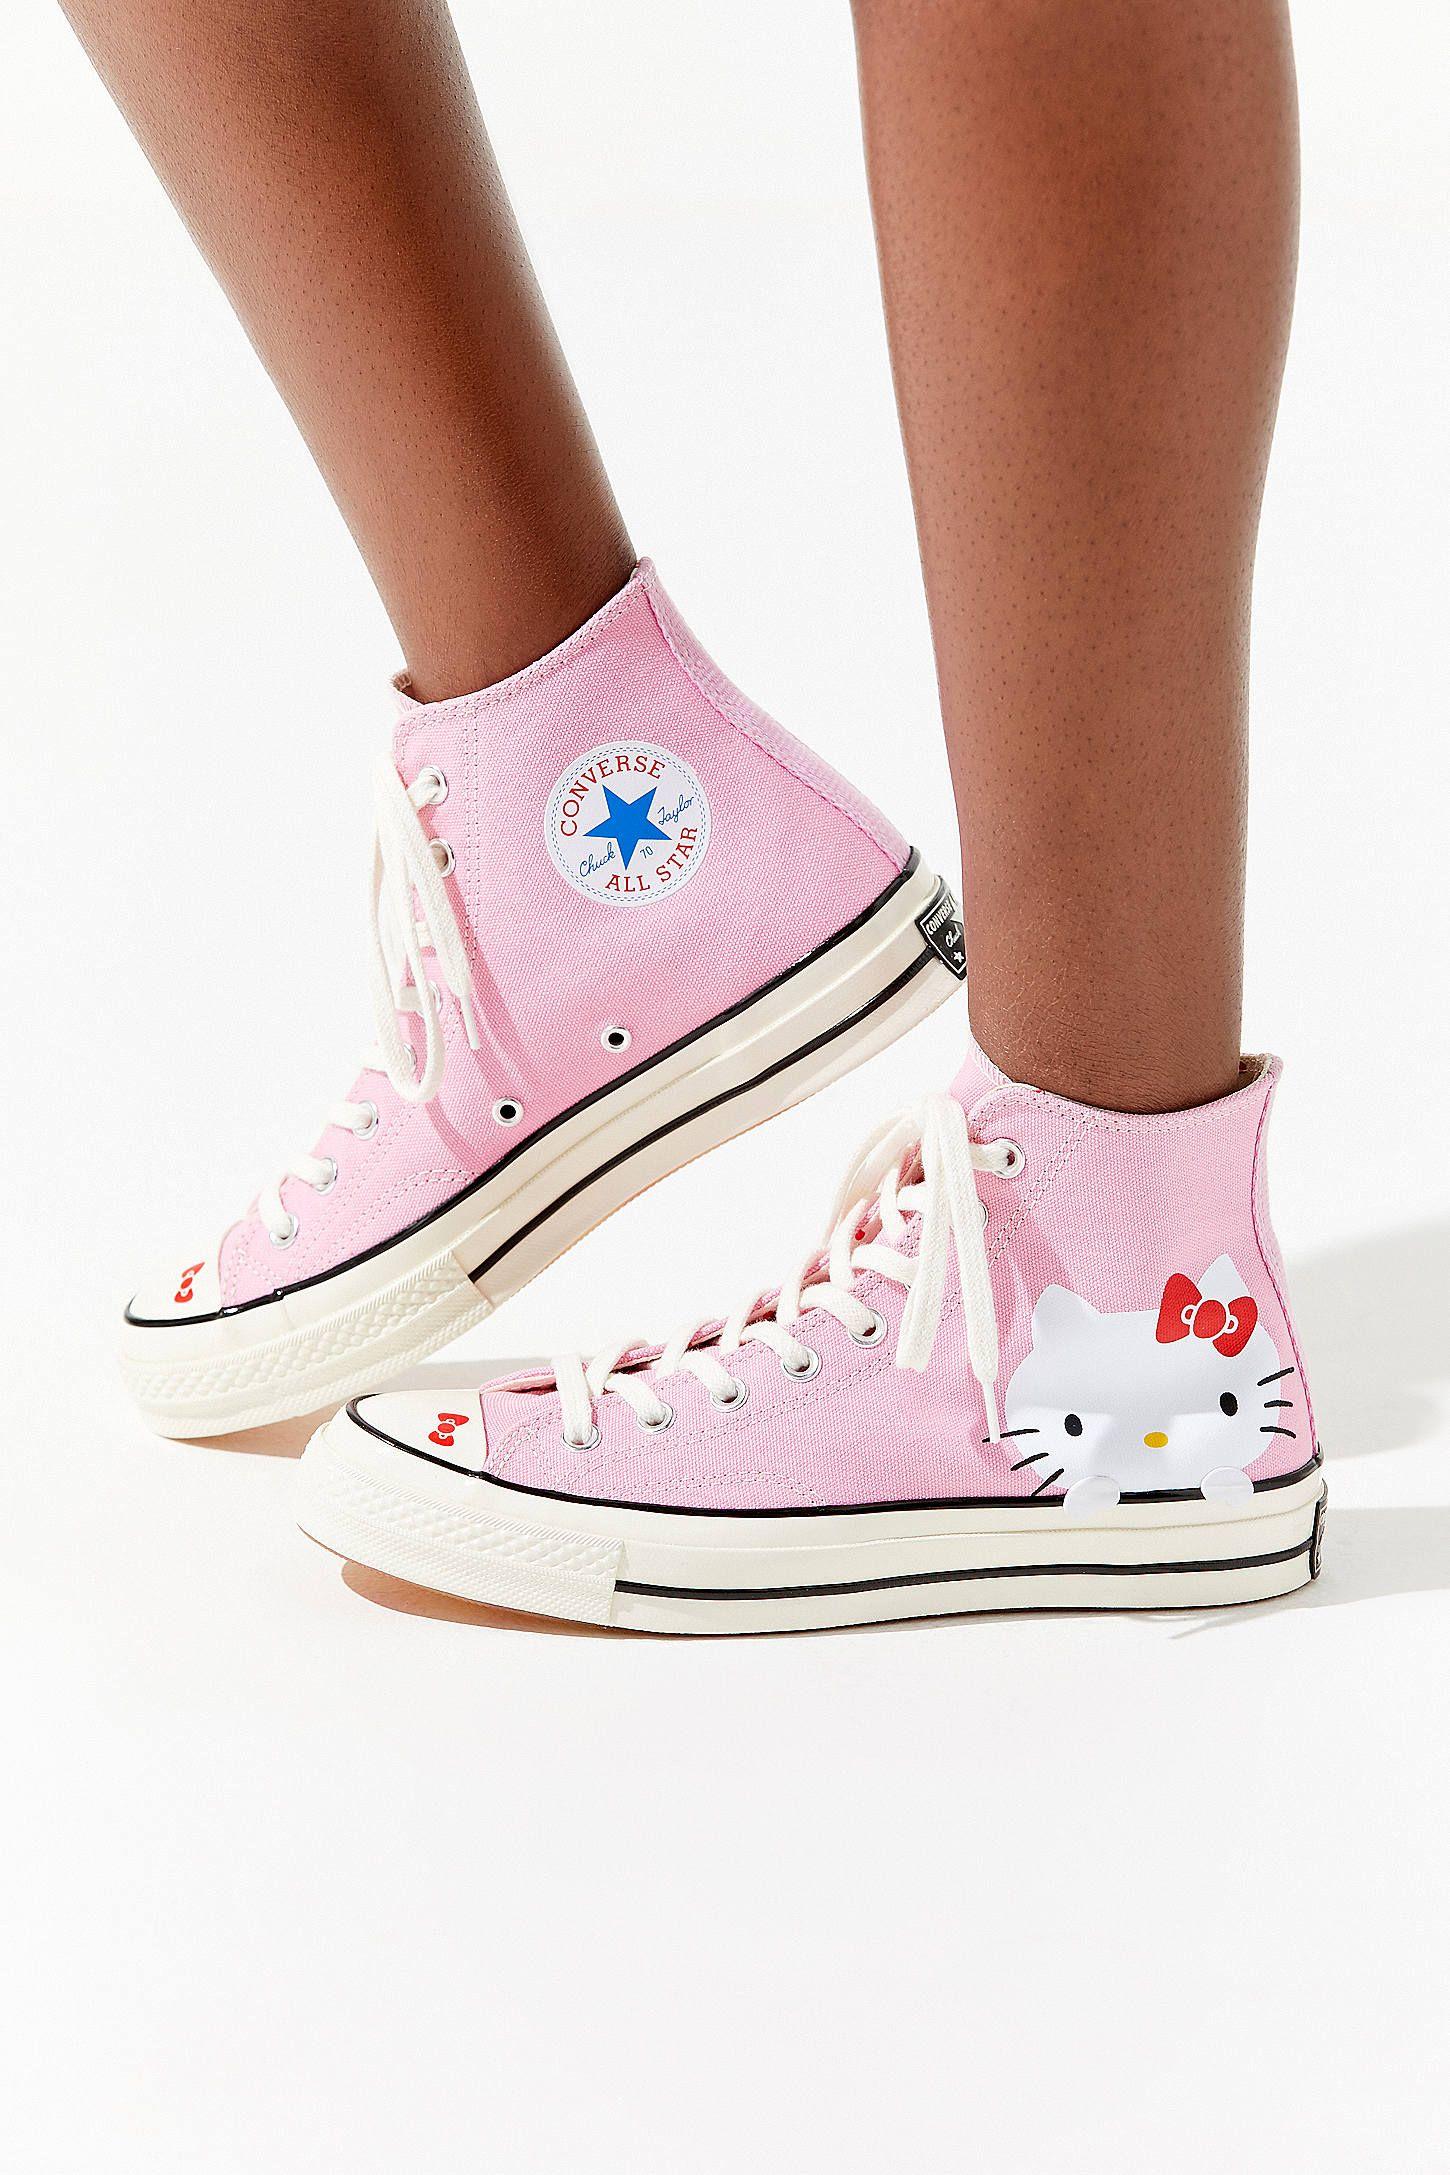 0f63e50984fa Converse X Hello Kitty Chuck 70 Canvas High Top Sneaker